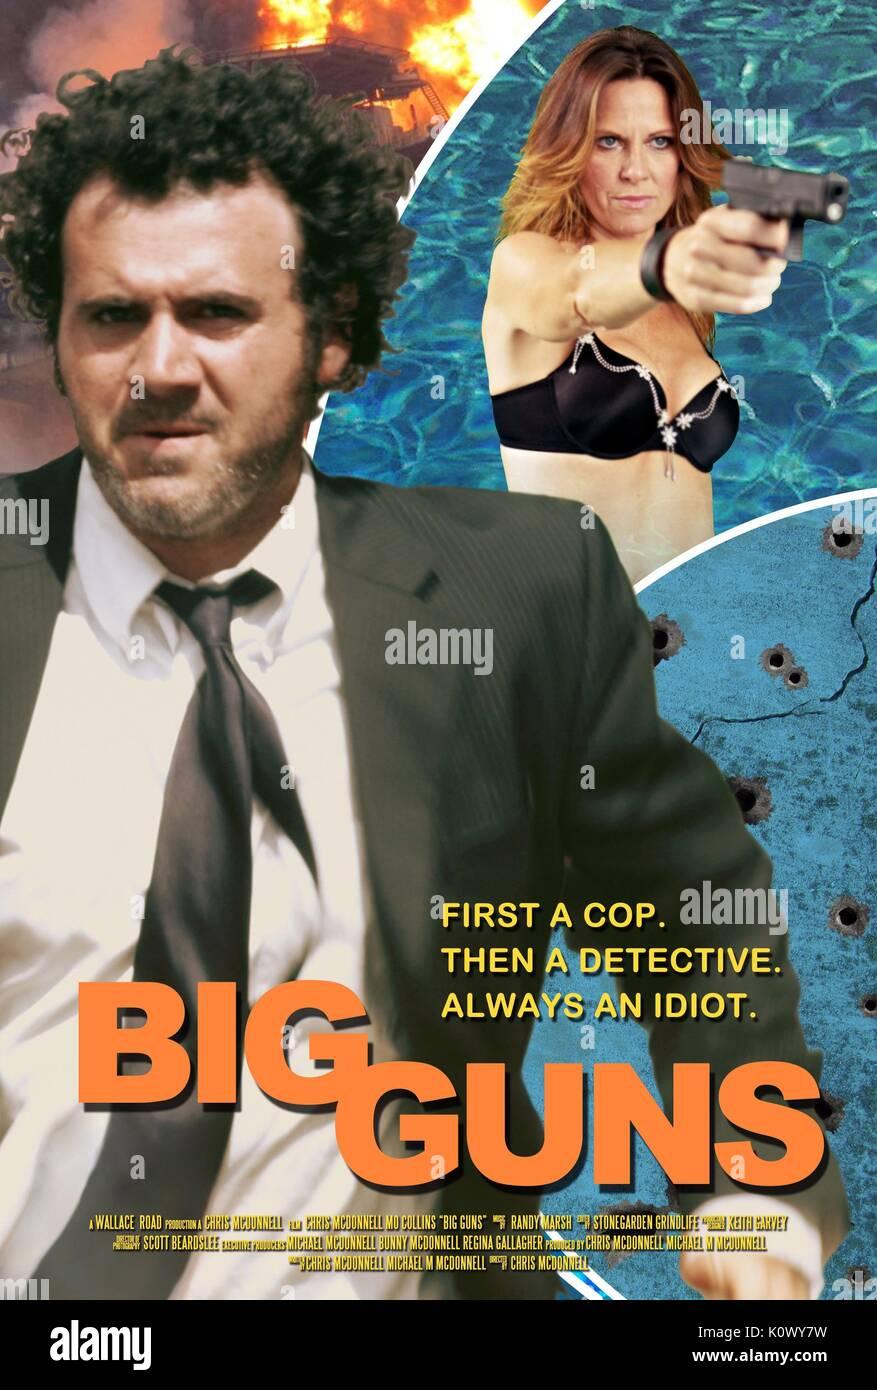 CHRIS MCDONNELL & MO COLLINS MCDICK; BIG GUNS (2015) - Stock Image